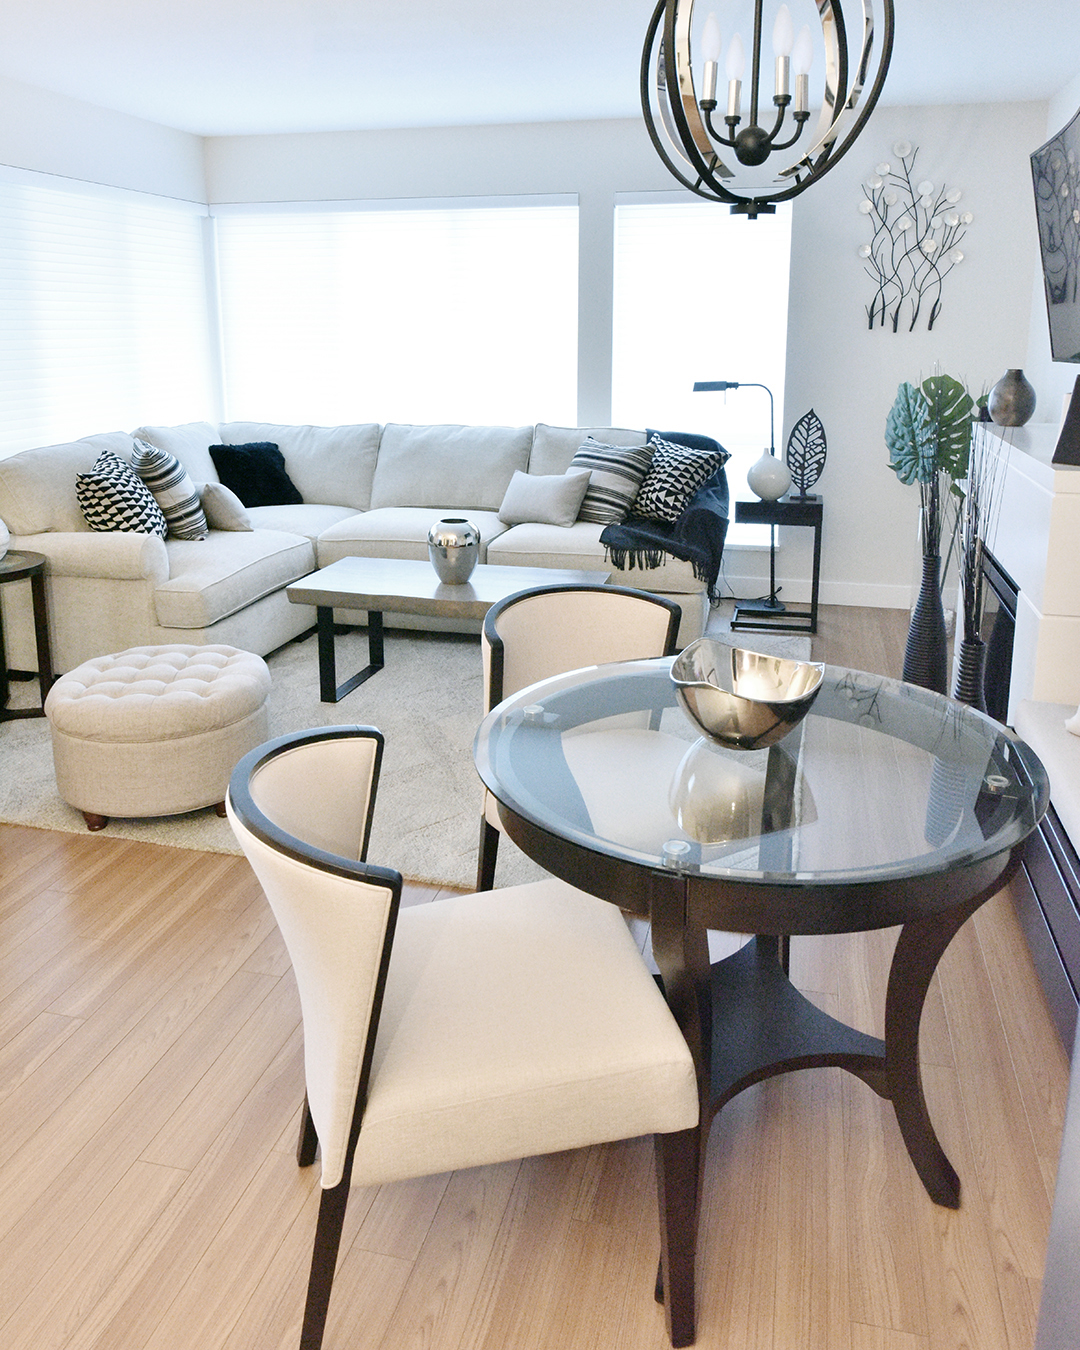 Small Condo Decorating Ideas | Buyer Select Blog | Designed by Tracy Svendsen